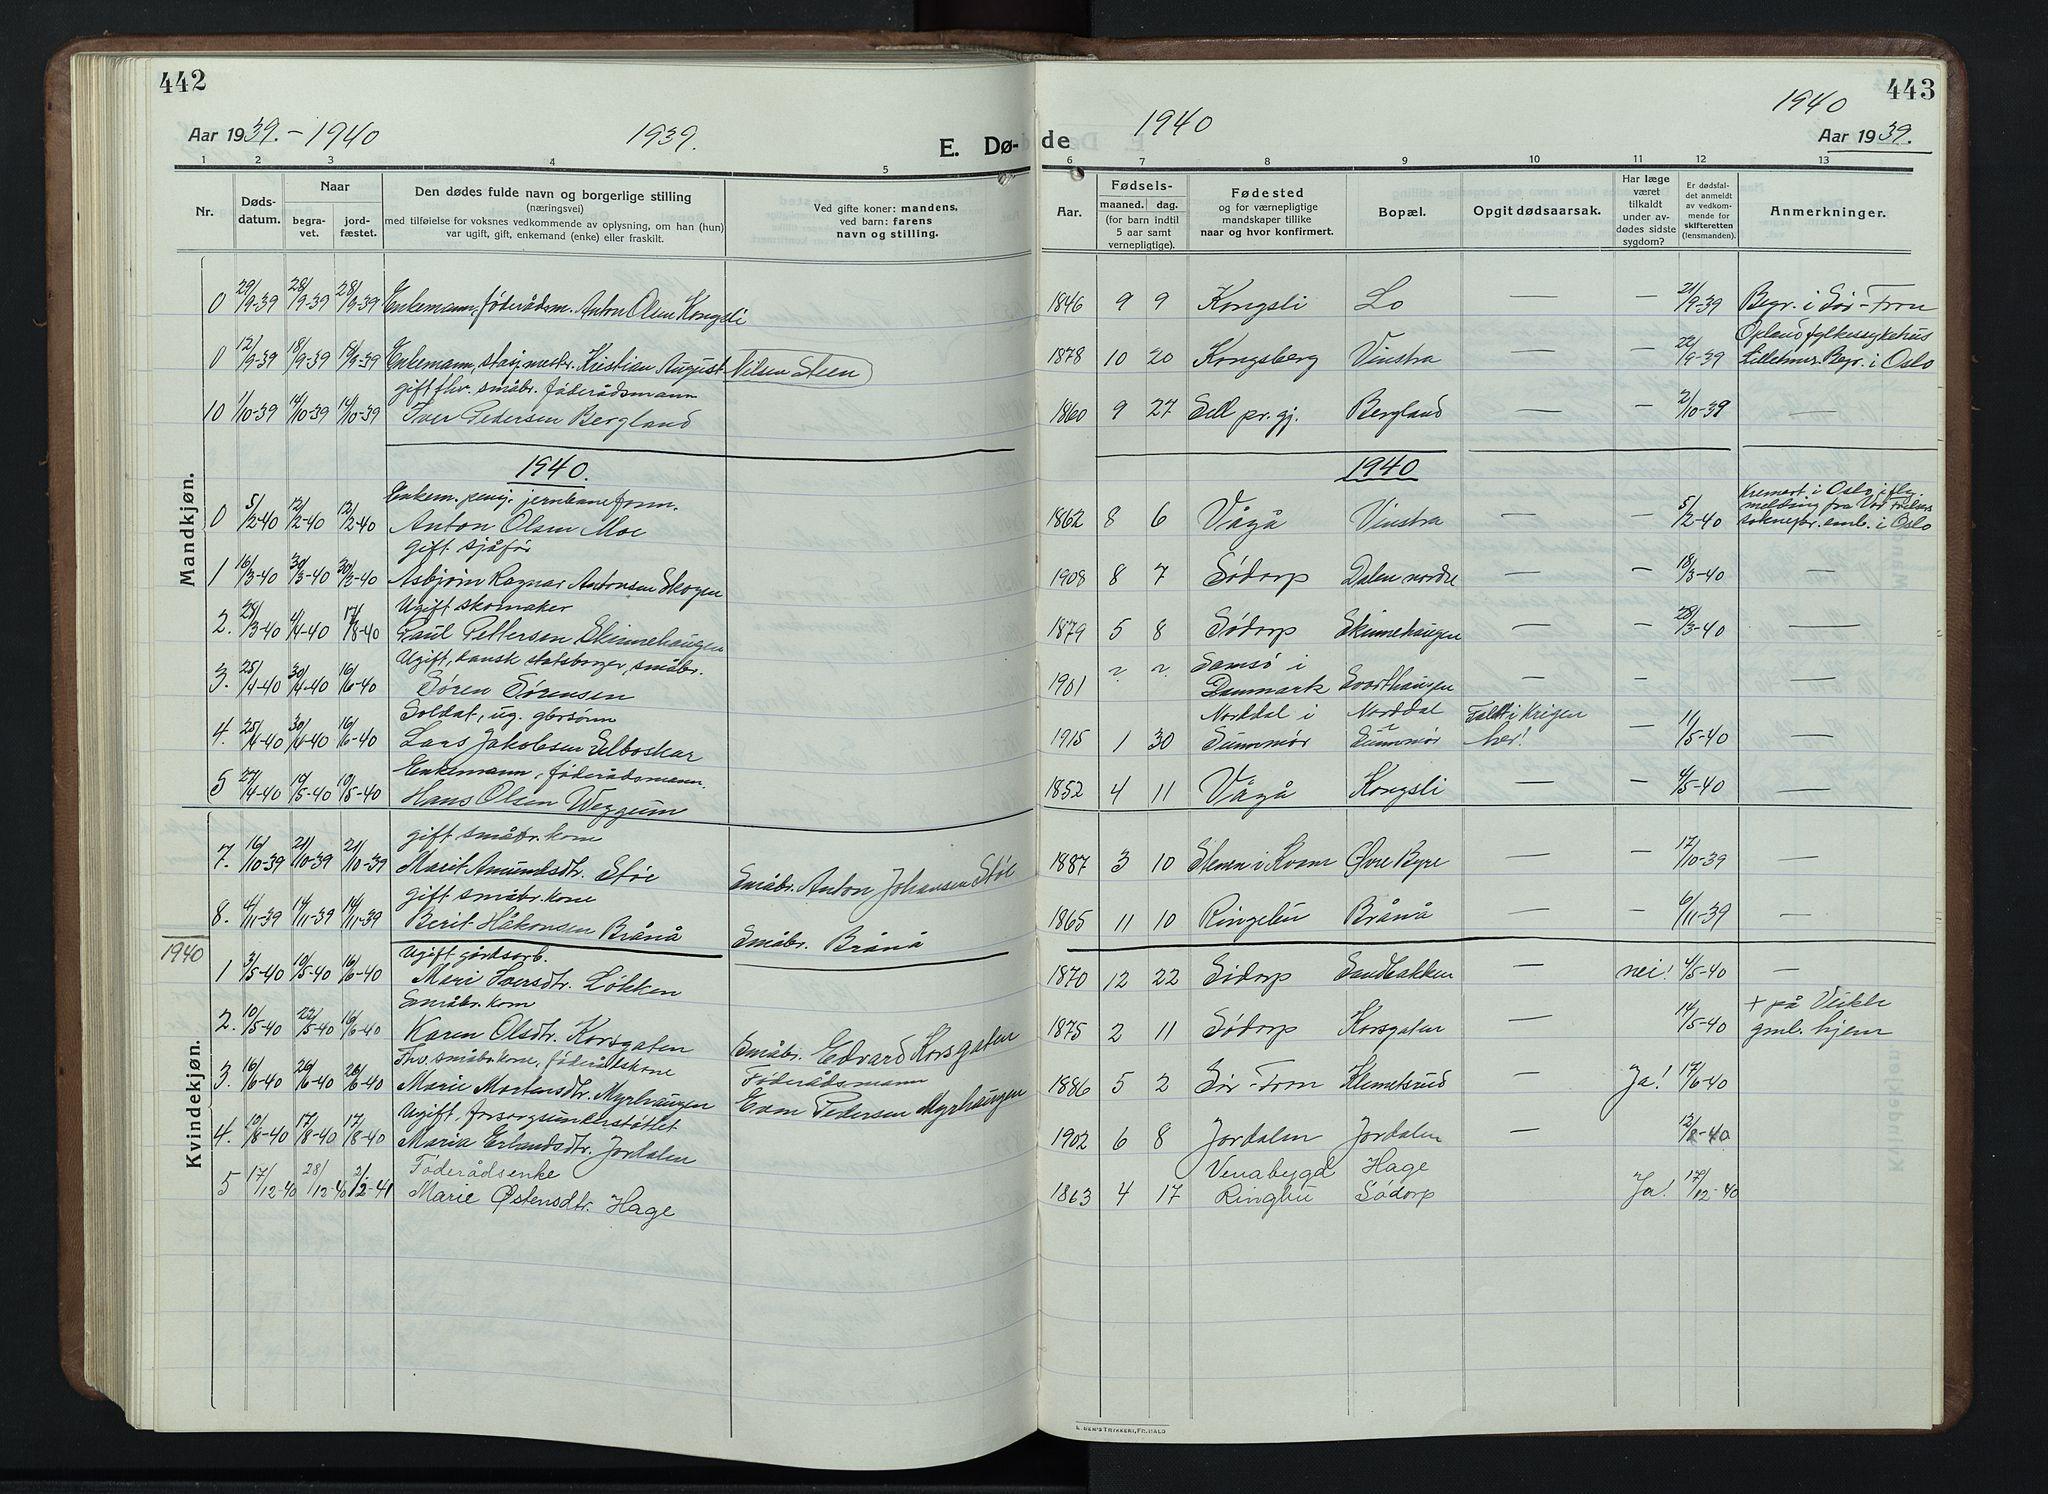 SAH, Nord-Fron prestekontor, Klokkerbok nr. 7, 1915-1946, s. 442-443